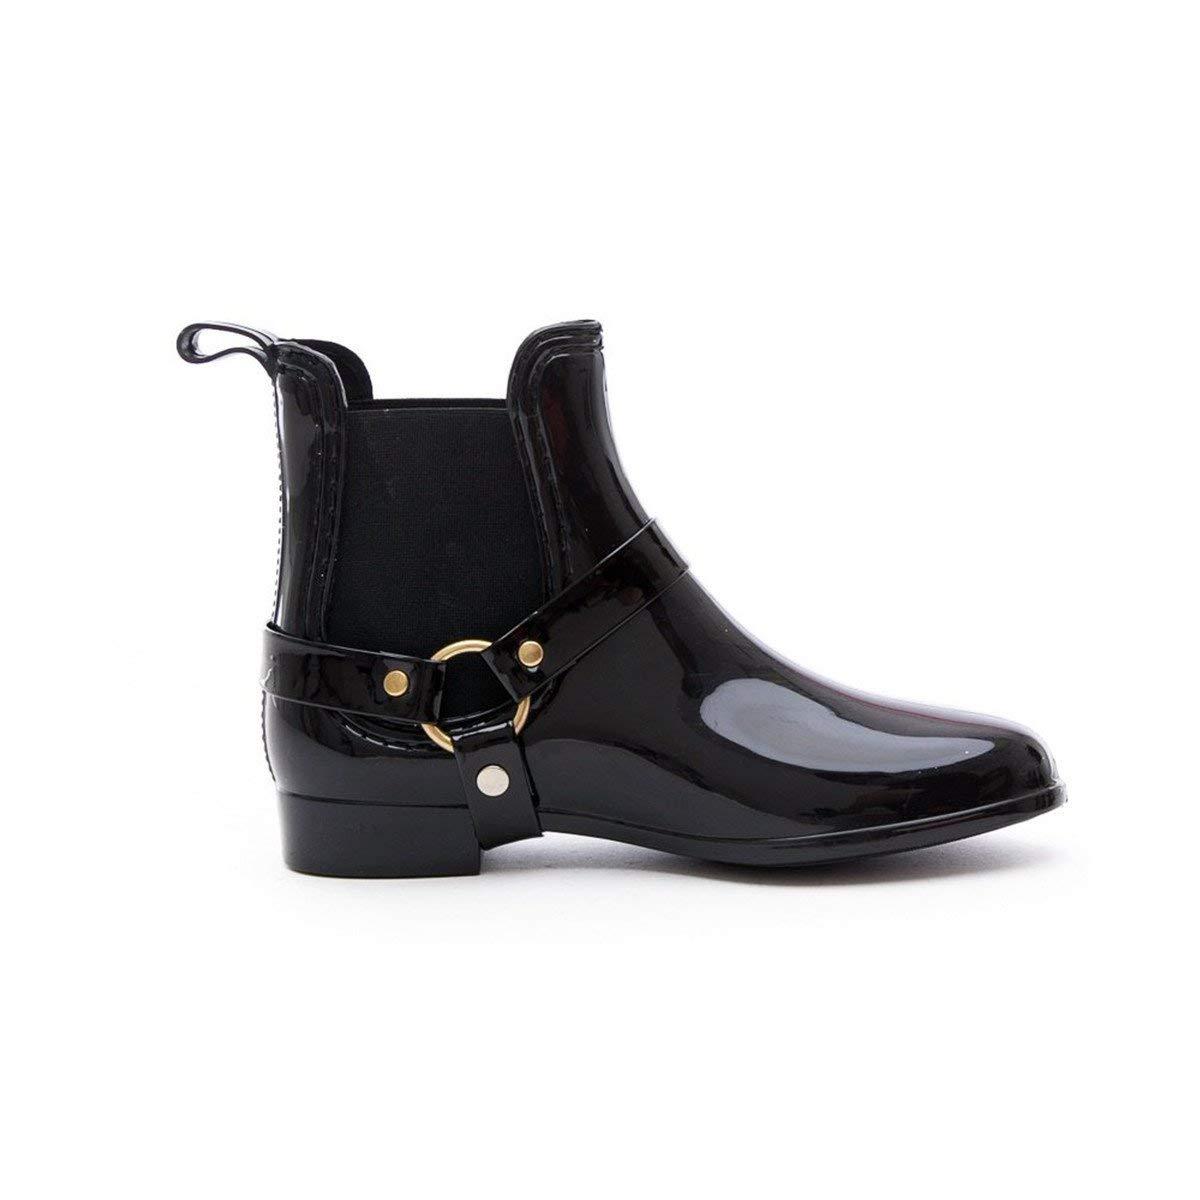 5c1e6b1b905d Get Quotations · Soho Shoes Women s Fashion Low Cut Ankle Rain Boots with  Straps